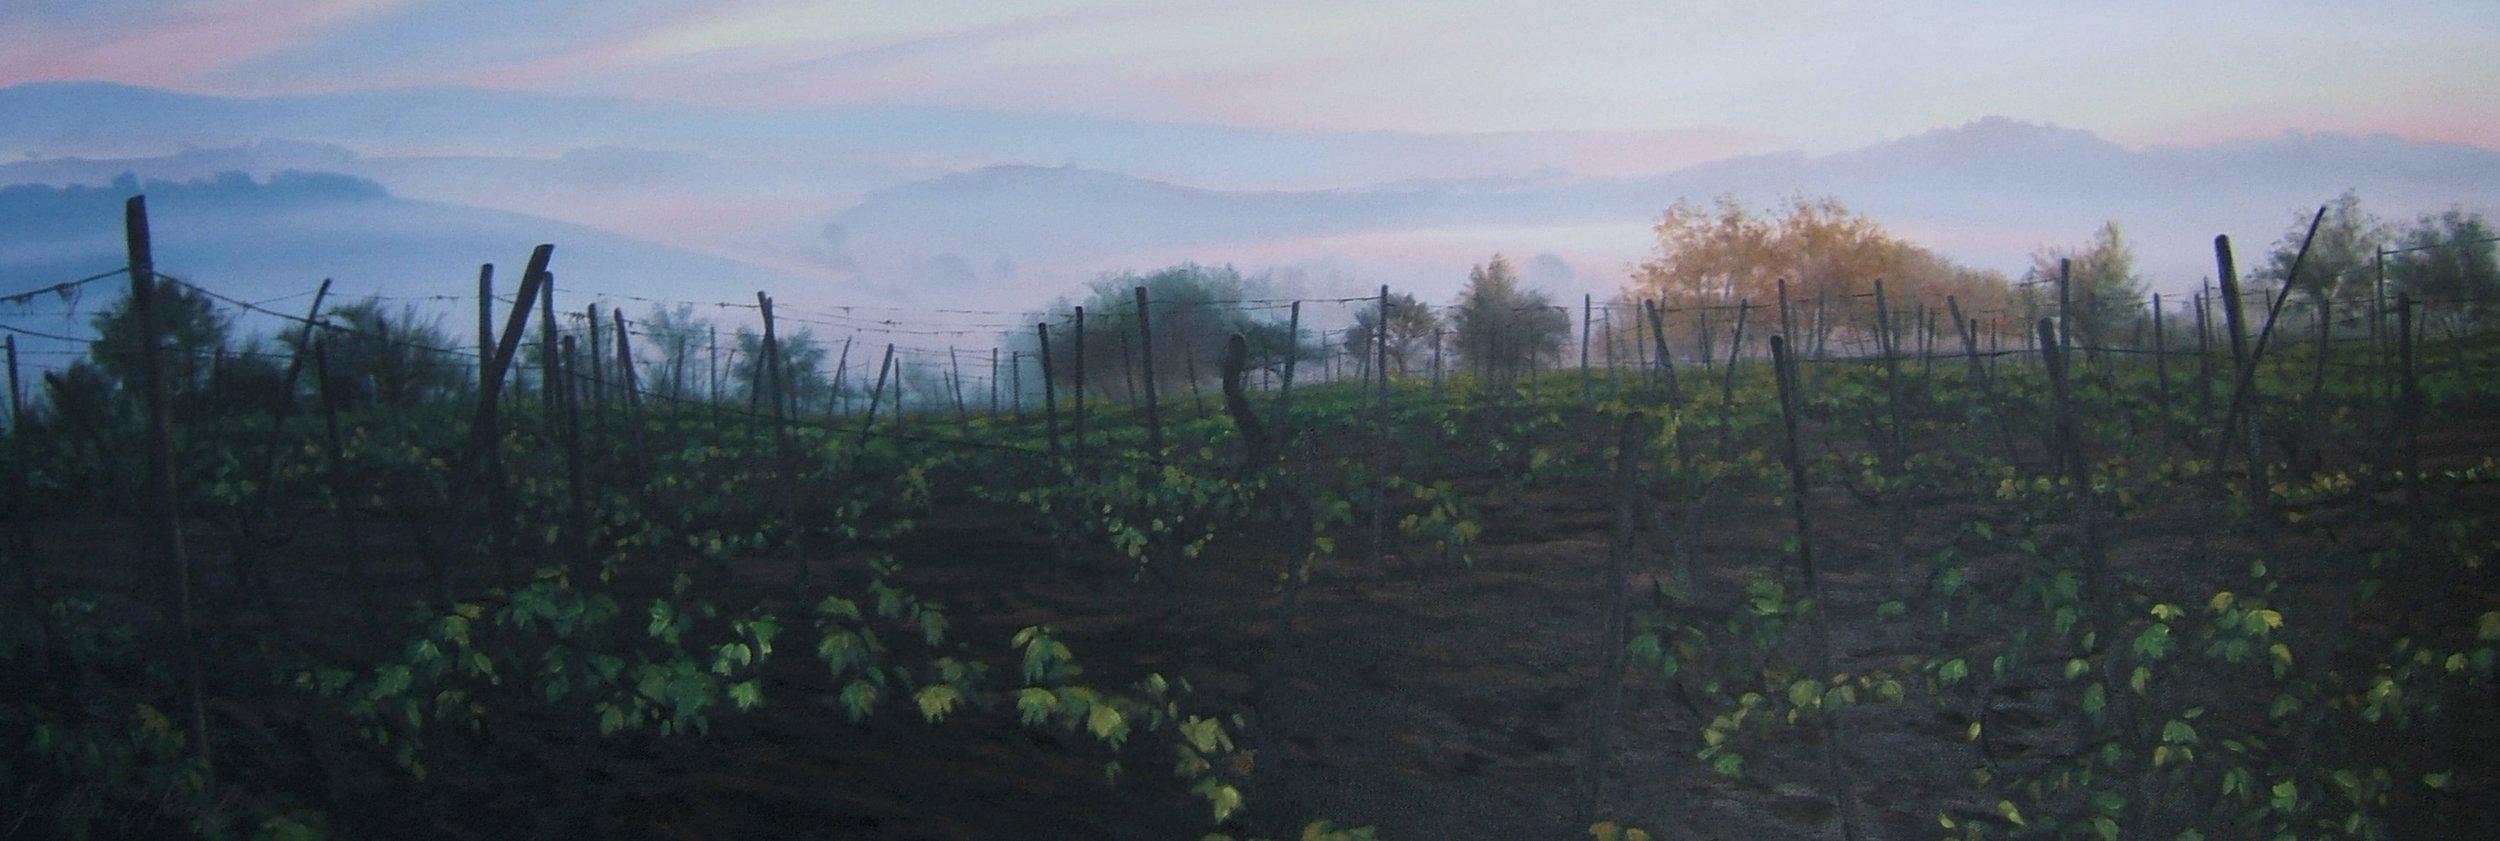 Morning Contemplation, Oil, Framed, 140 x 40cm,  SOLD